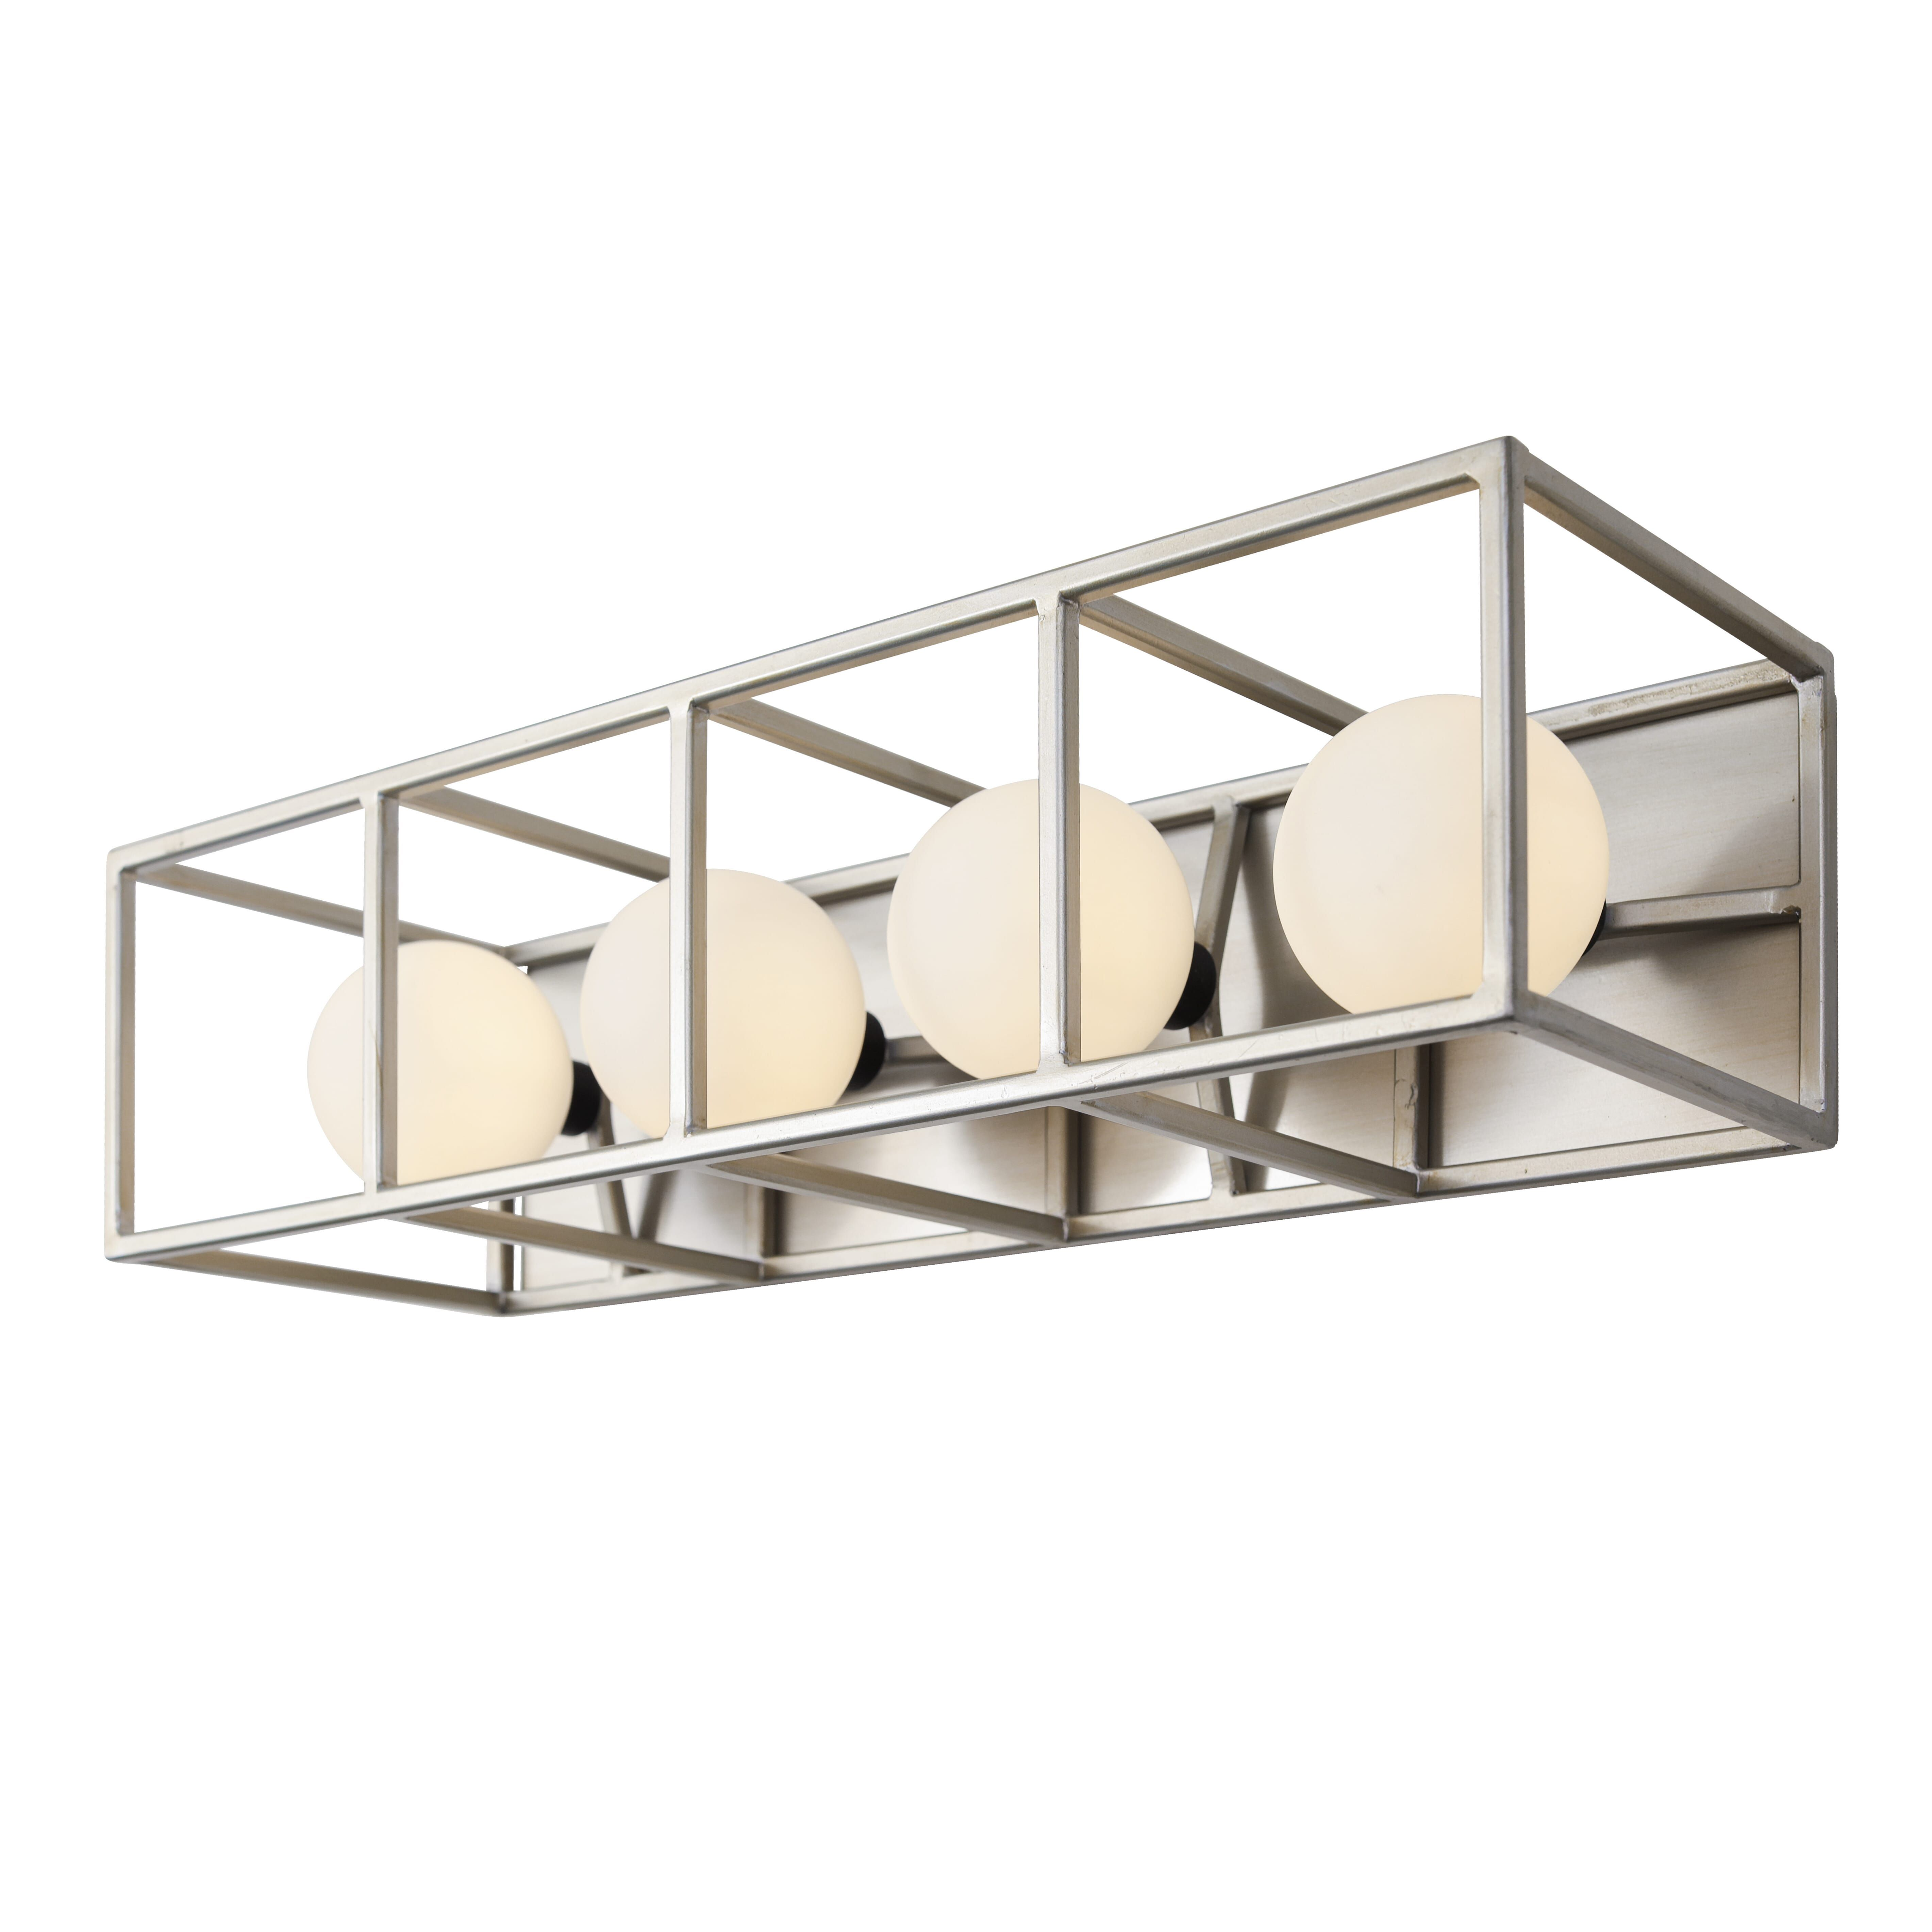 Photo of Varaluz Plaza 4-Light 5″ Bathroom Vanity Light in Silverado with Carbon